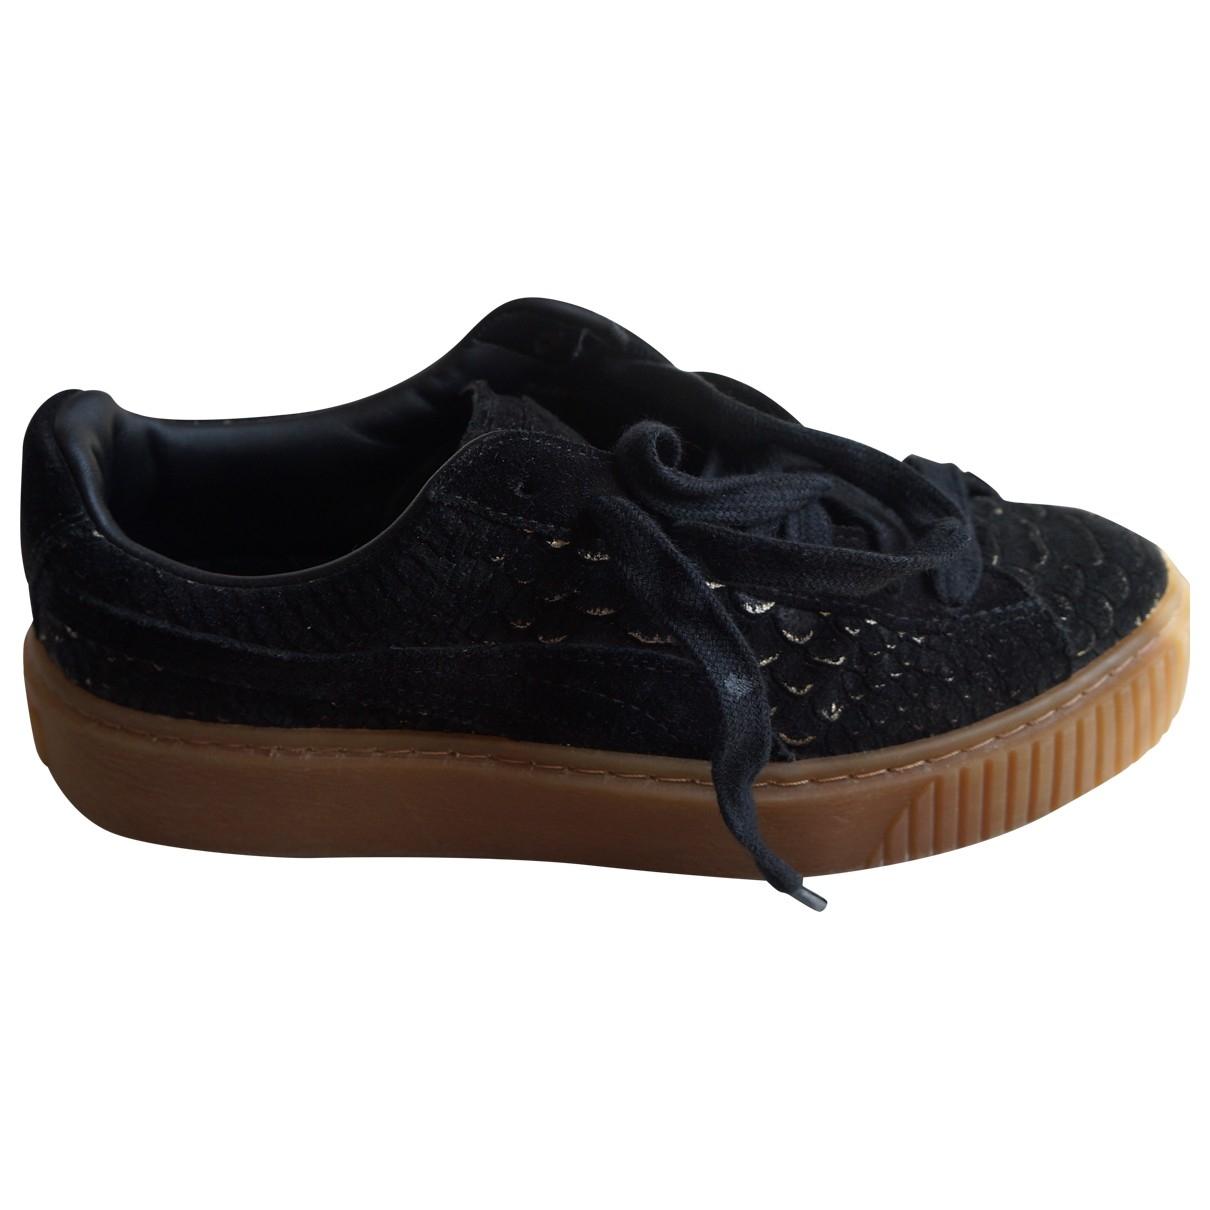 Puma \N Sneakers in  Schwarz Leinen